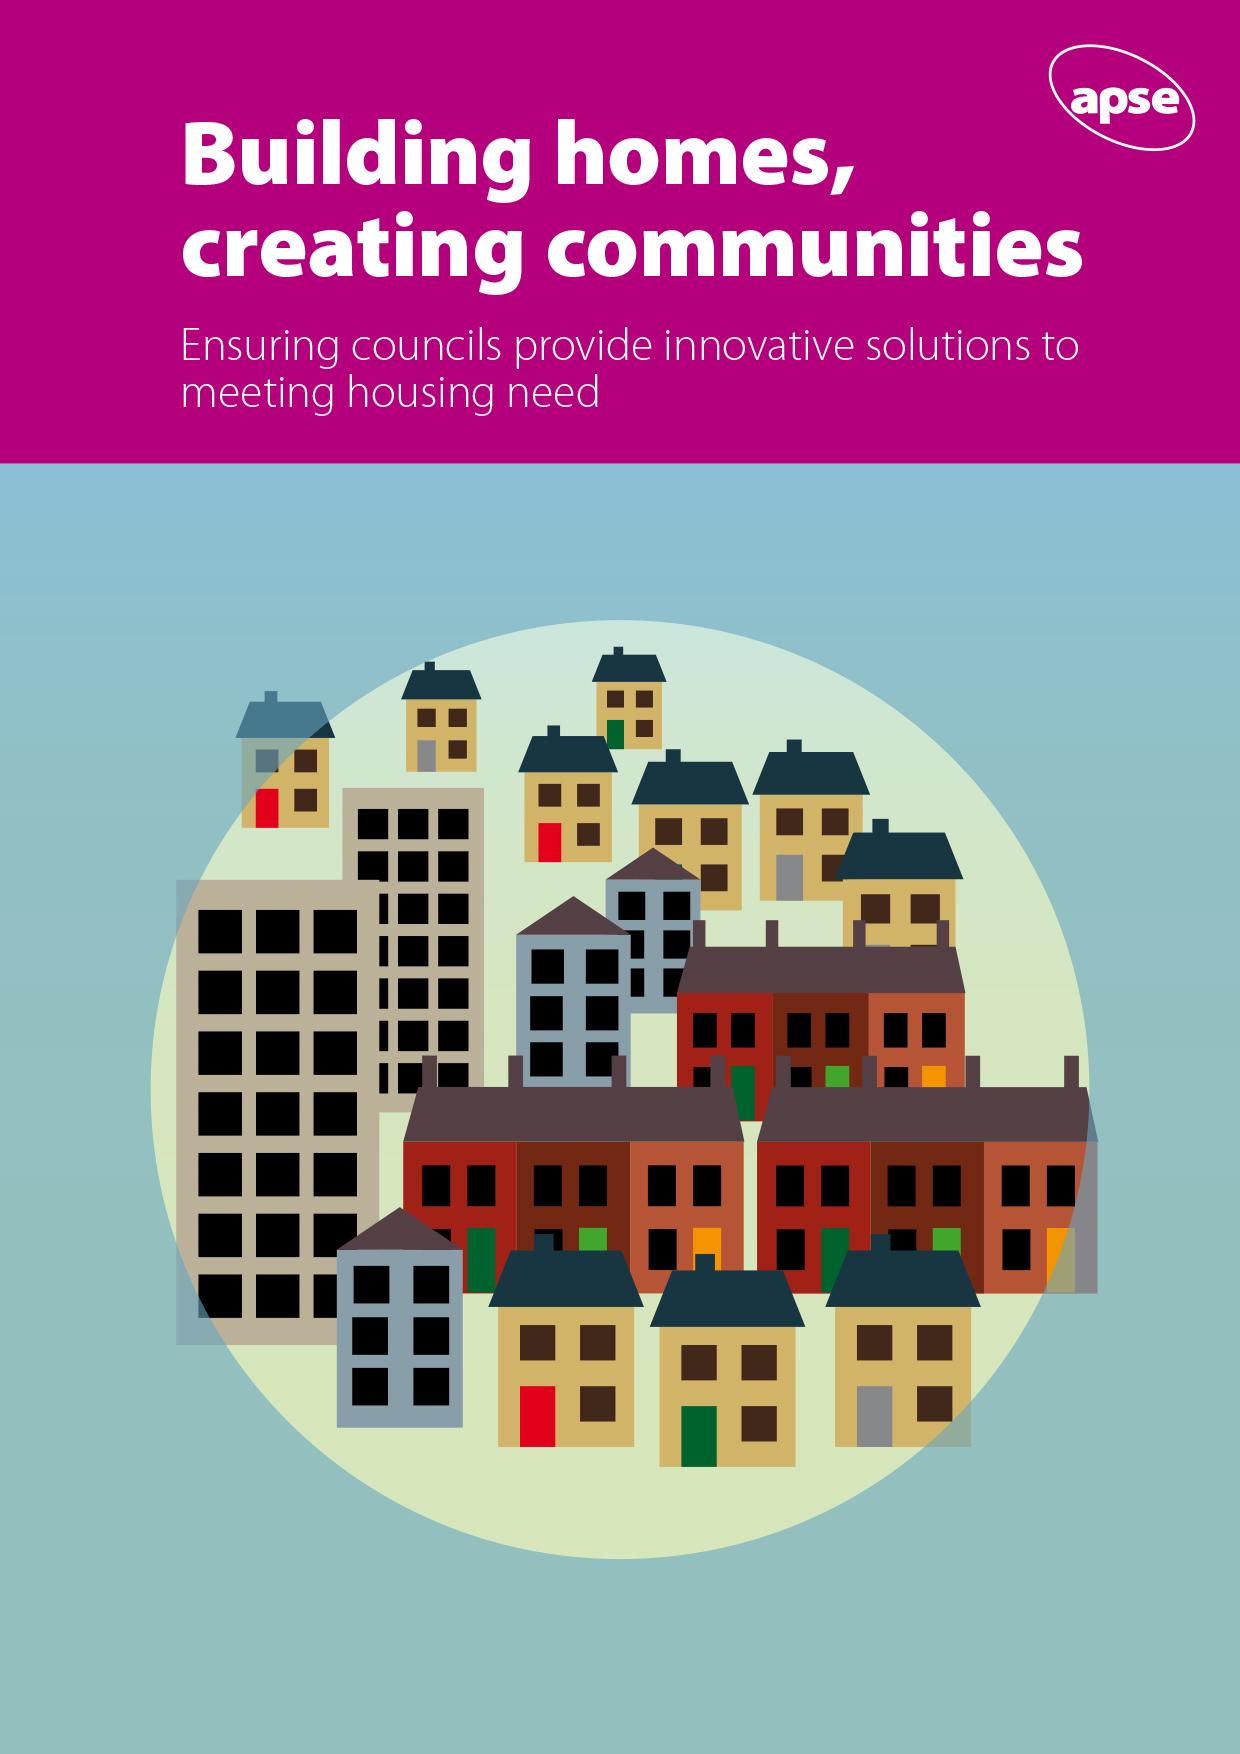 Building homes, creating communities